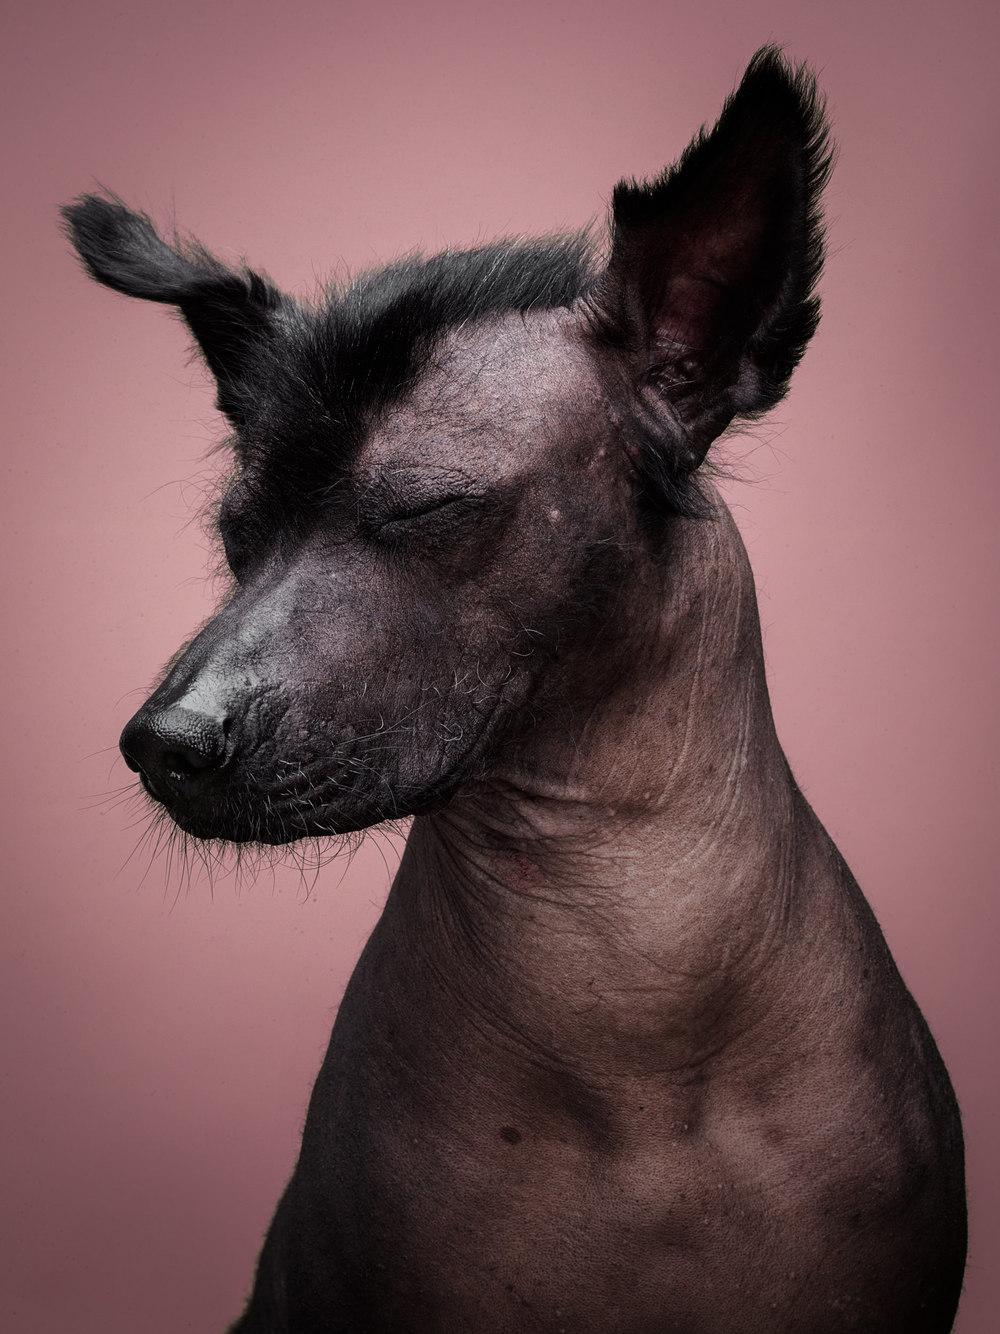 naked-dogs-klausdyba-32.jpg